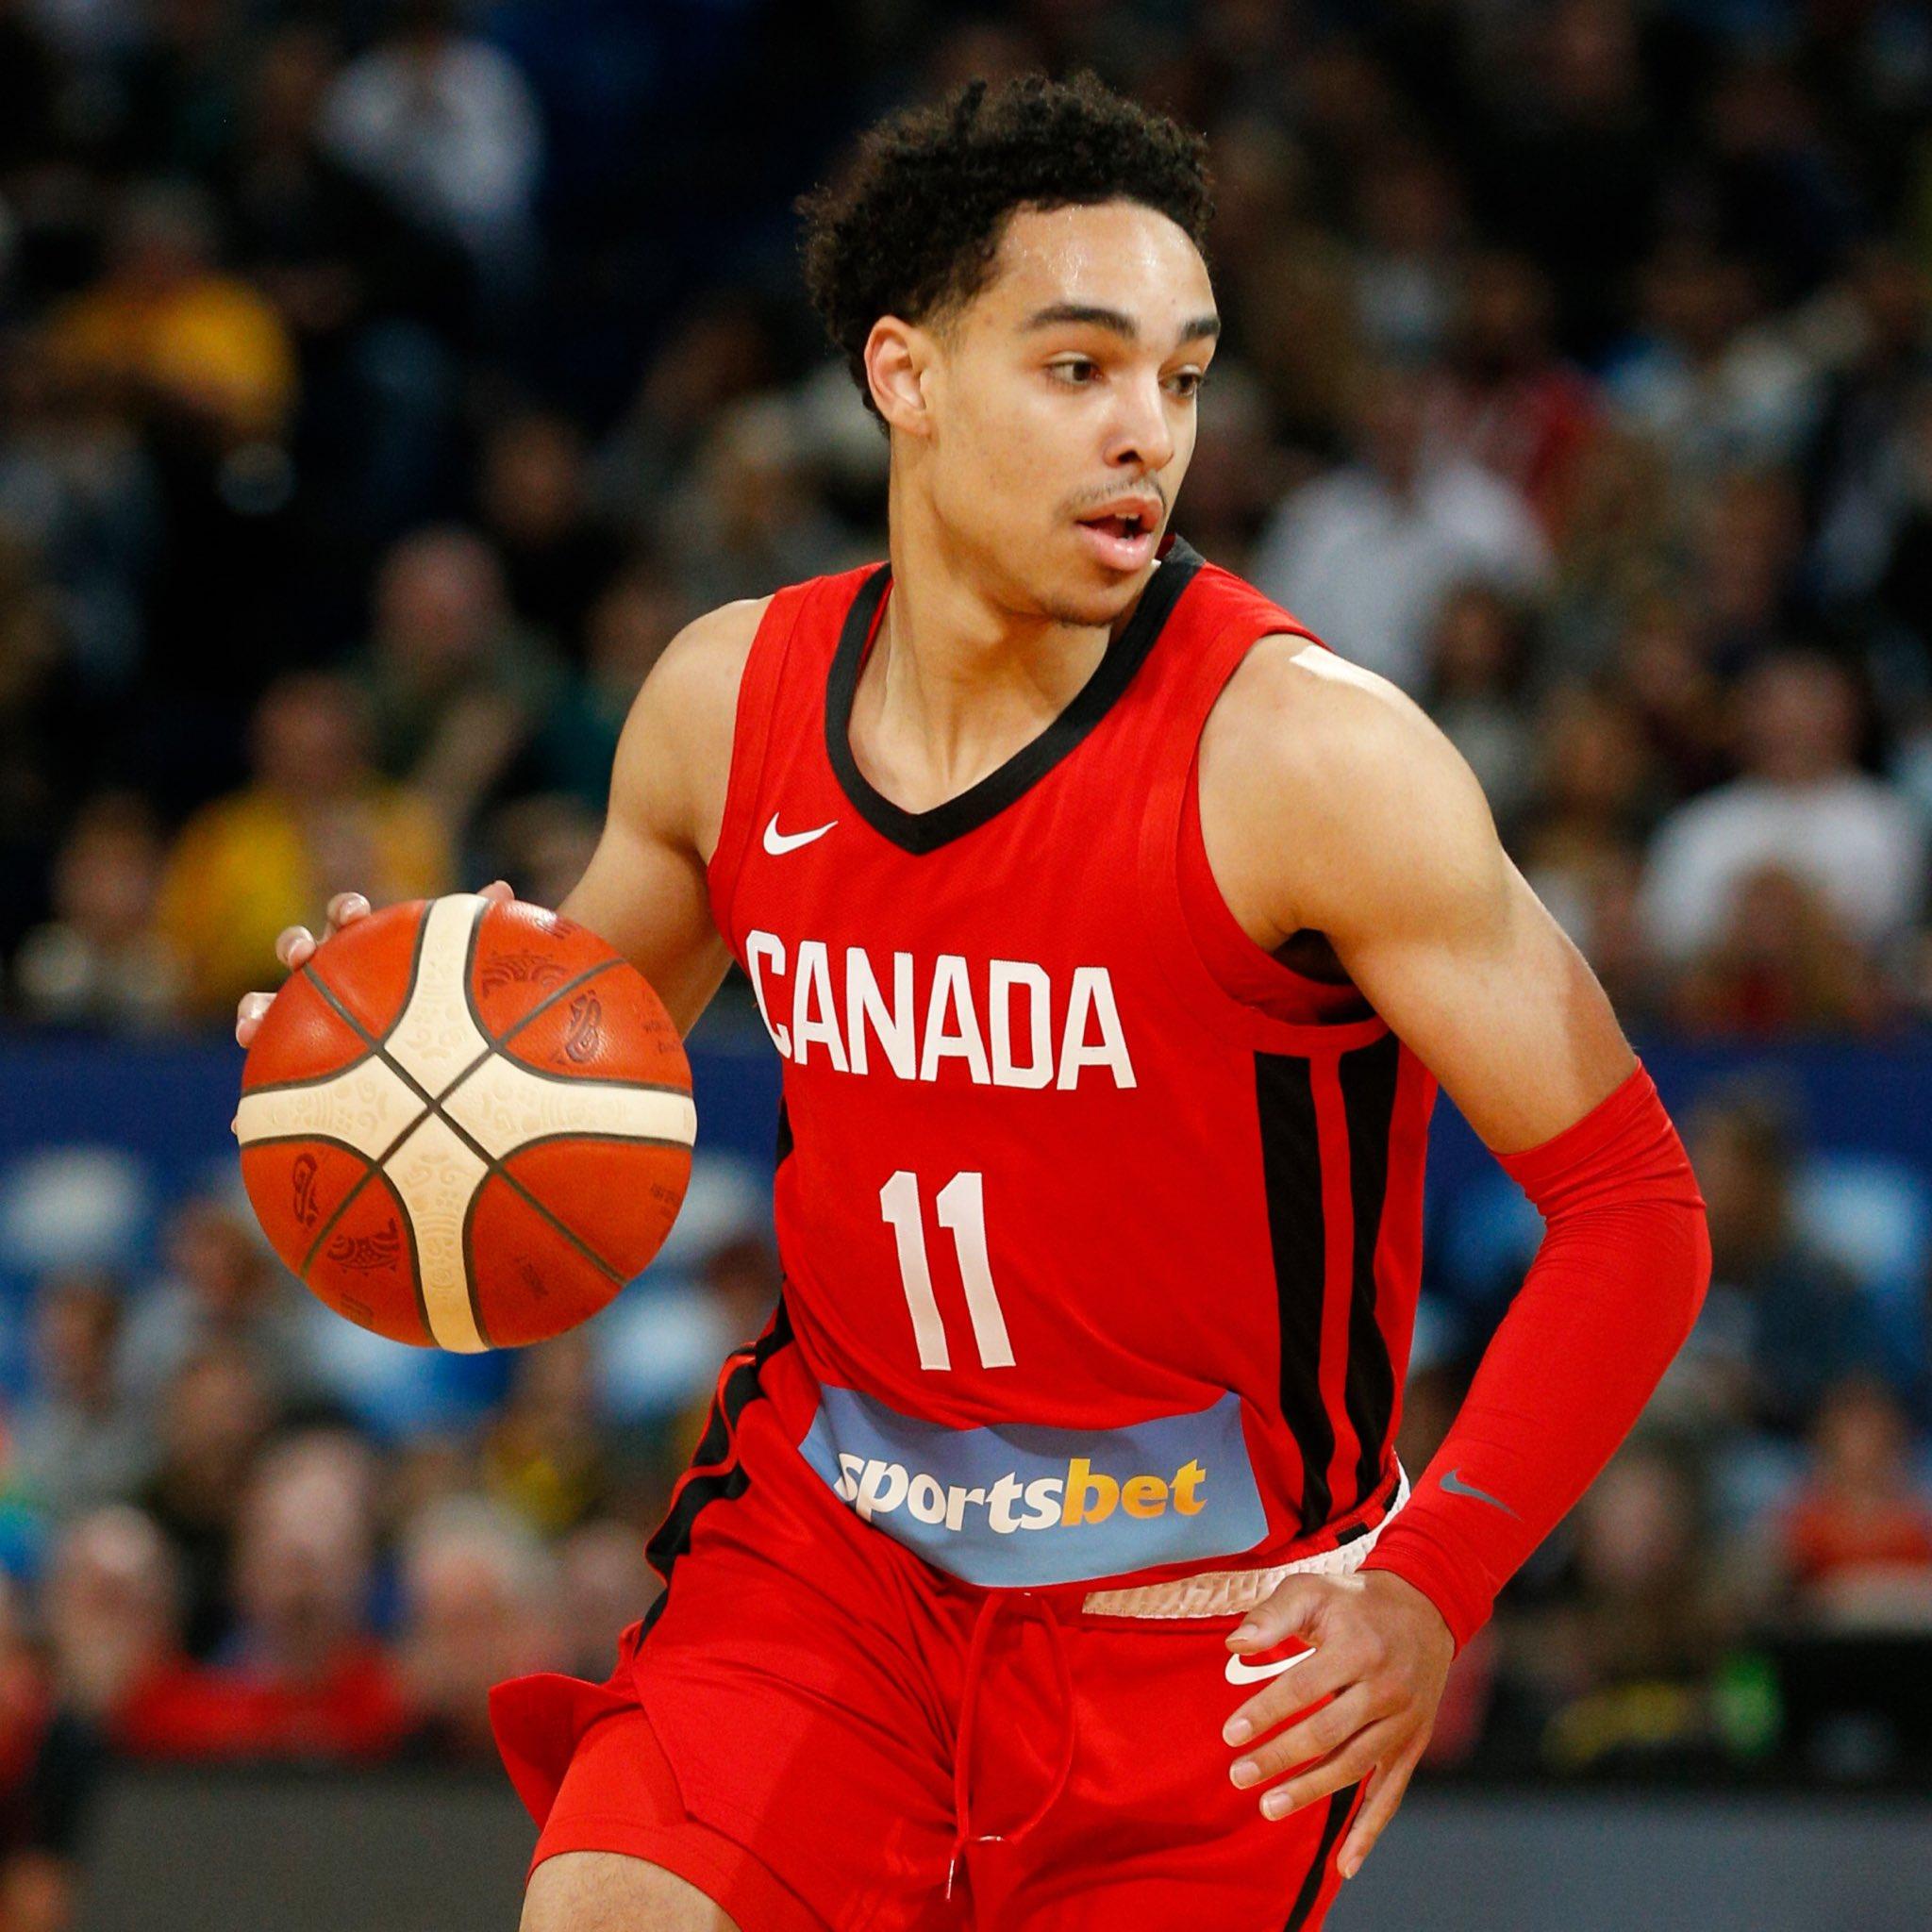 Canada defeats hosts Australia to open the International Basketball Series